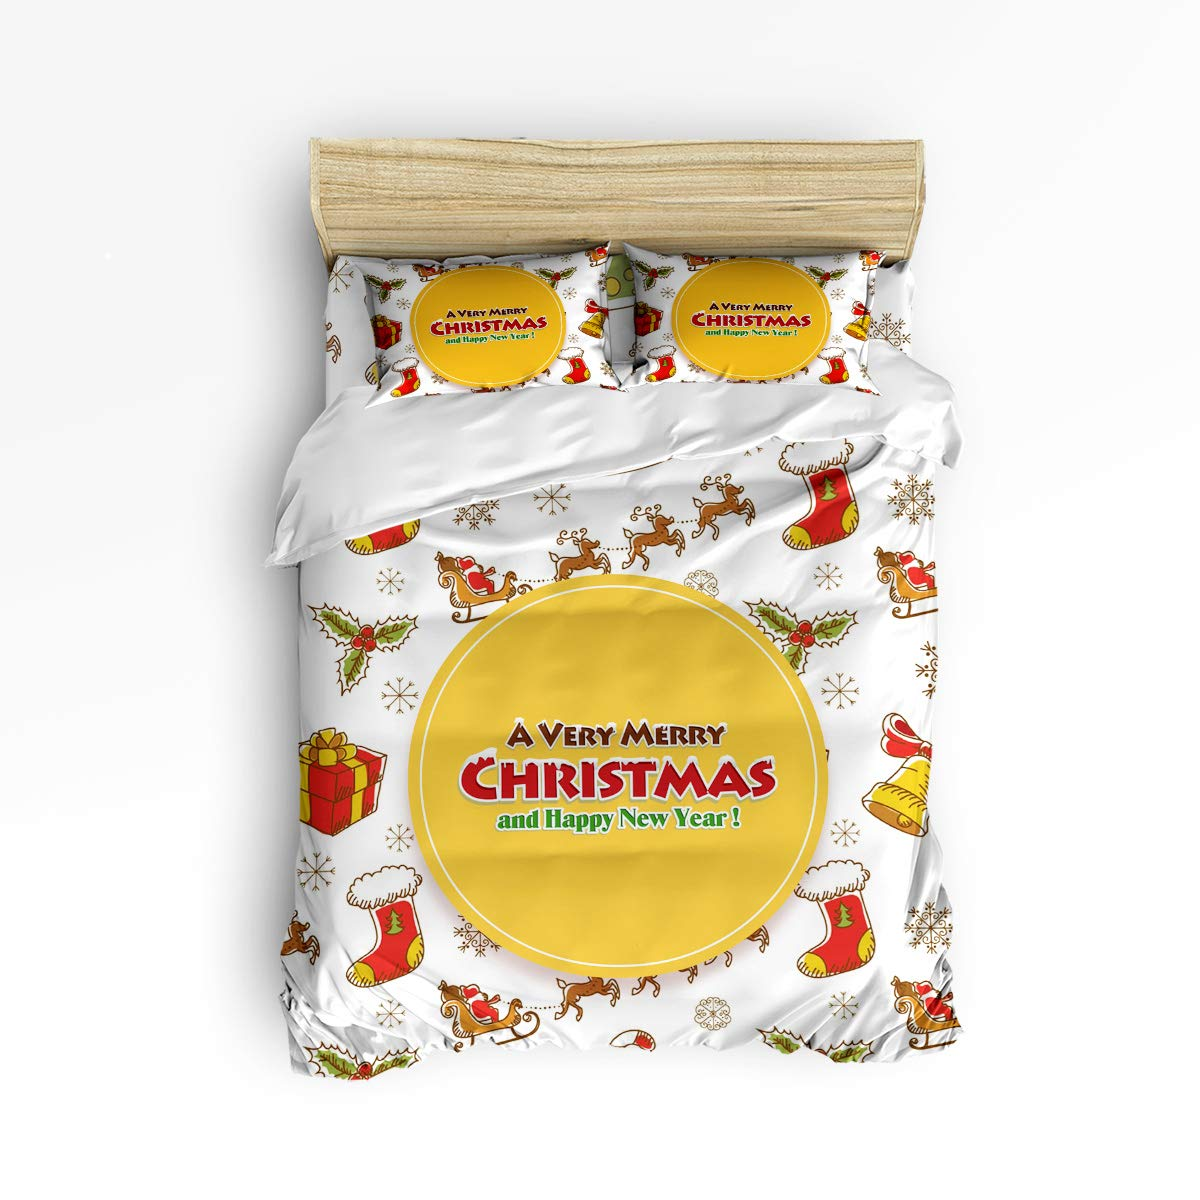 Z&L Home メリークリスマス 寝具4点セット 掛け布団カバー カートゥーン ホリデーパターン ラグジュアリー ソフト フラット シーツセット 装飾枕カバー付き ティーン ガールズ ボーイズ メンズ レディース キッズ フル LFFMARNM11210EWLYX-SWTQ00933SJTBZLH B07KQZ53TD Merrychristmas29 フル